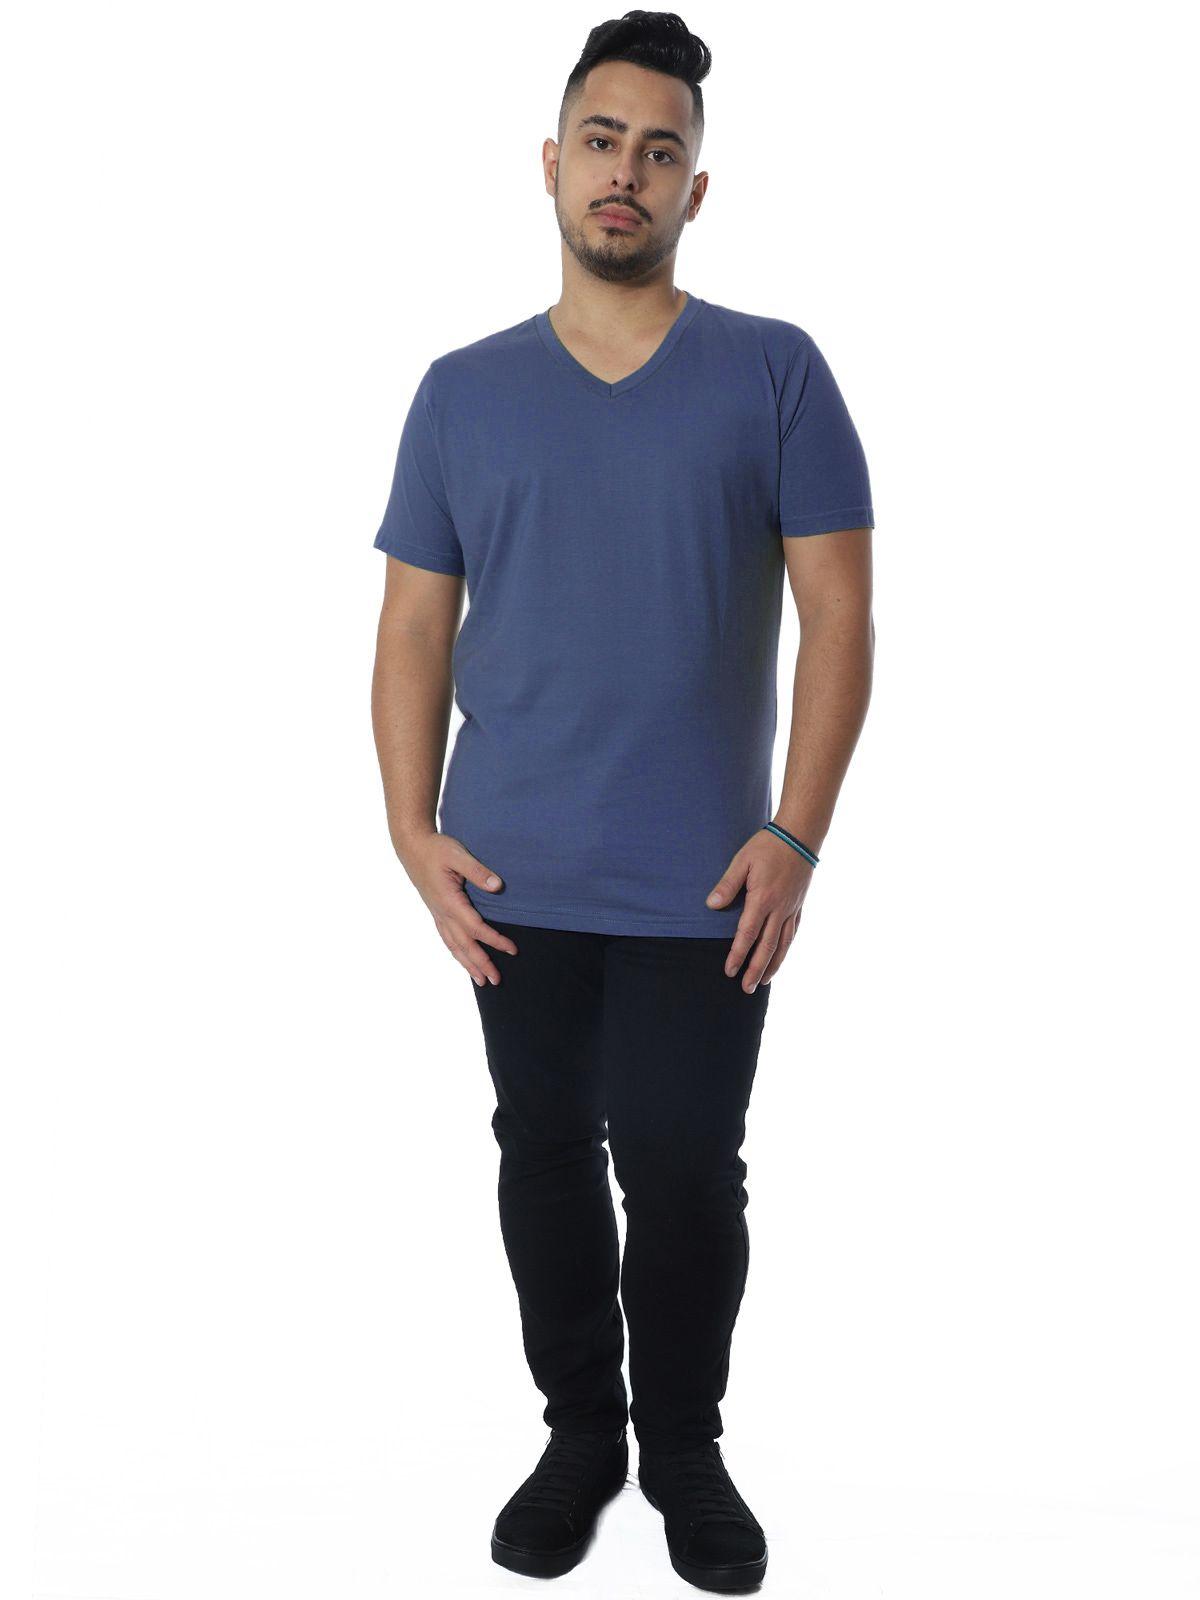 Camiseta Anistia Slim Fit Decote V. Lisa Jeans